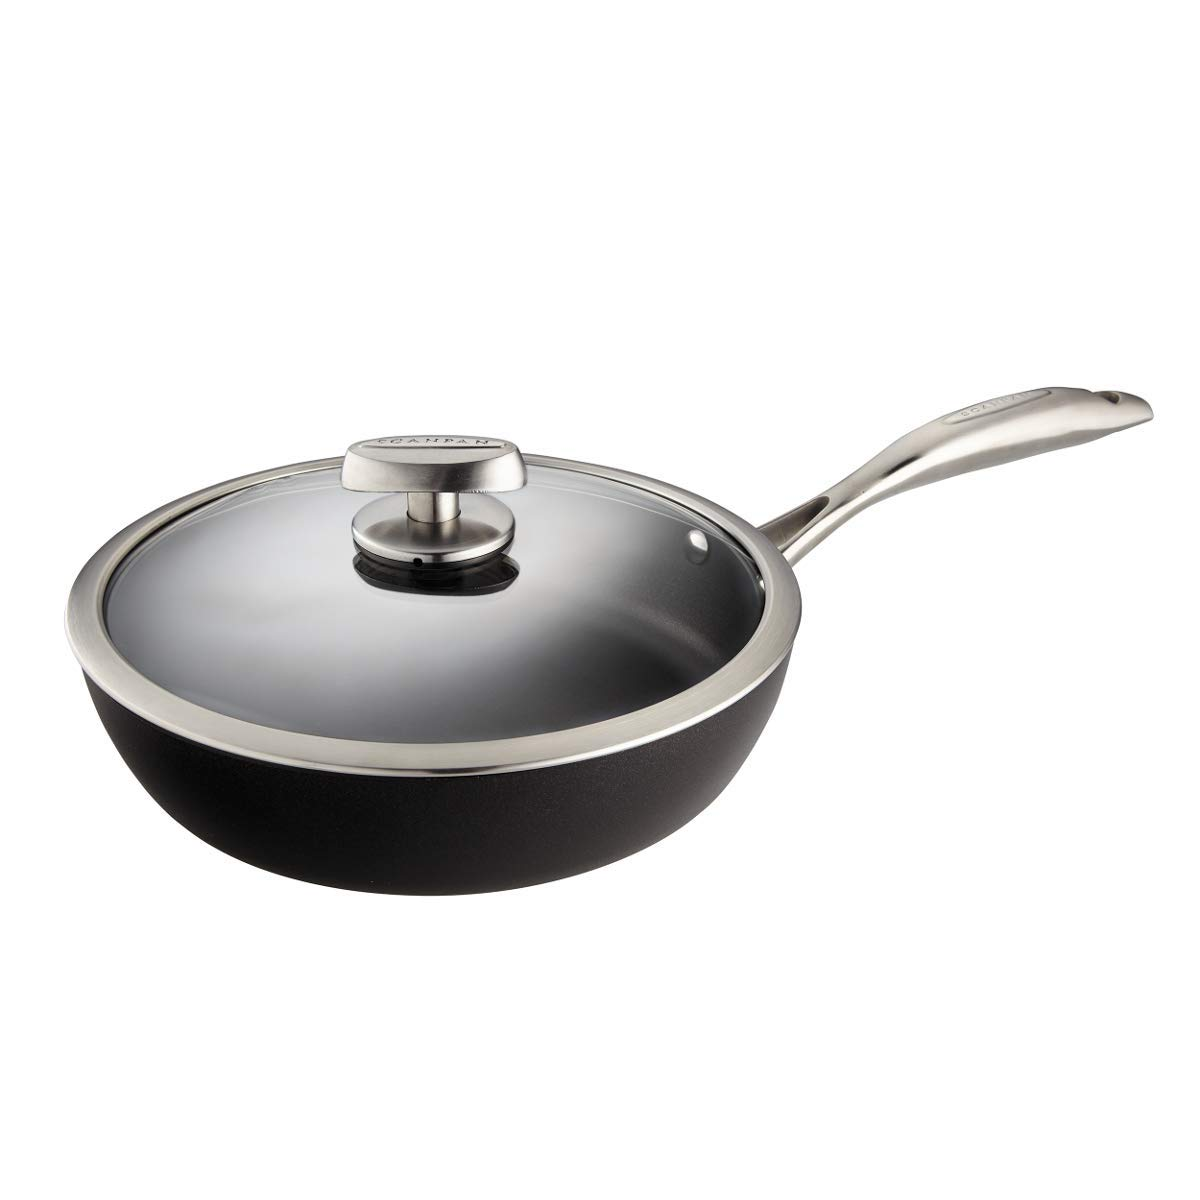 Scanpan PRO IQ Nonstick Covered Saute Pan, 2.75 quart, Black by Scanpan (Image #2)